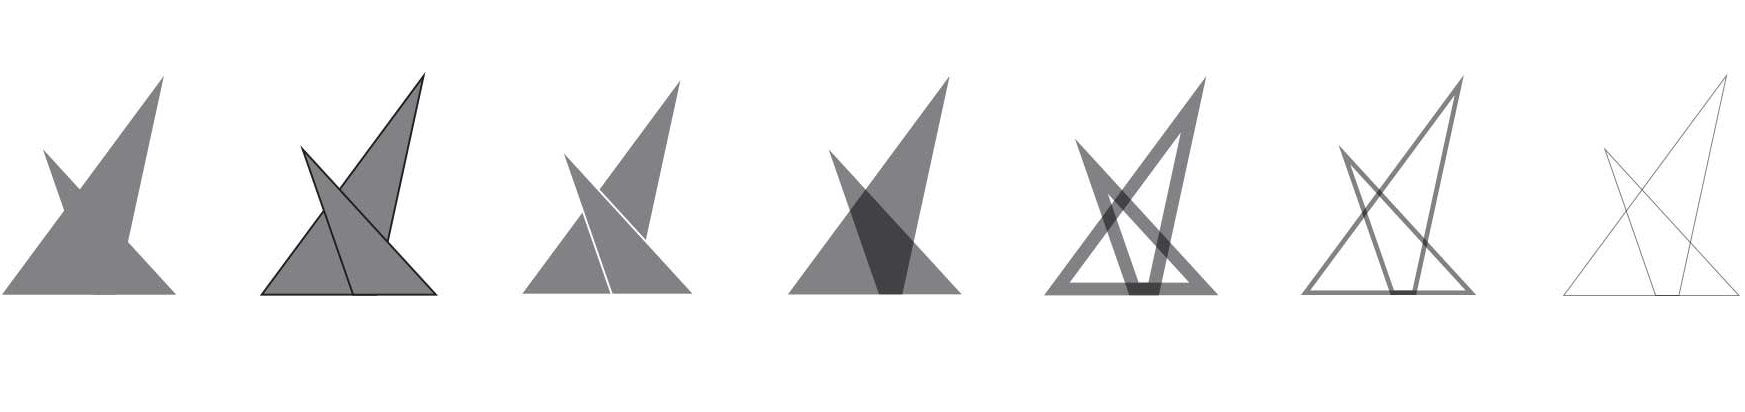 benson-triangles-2